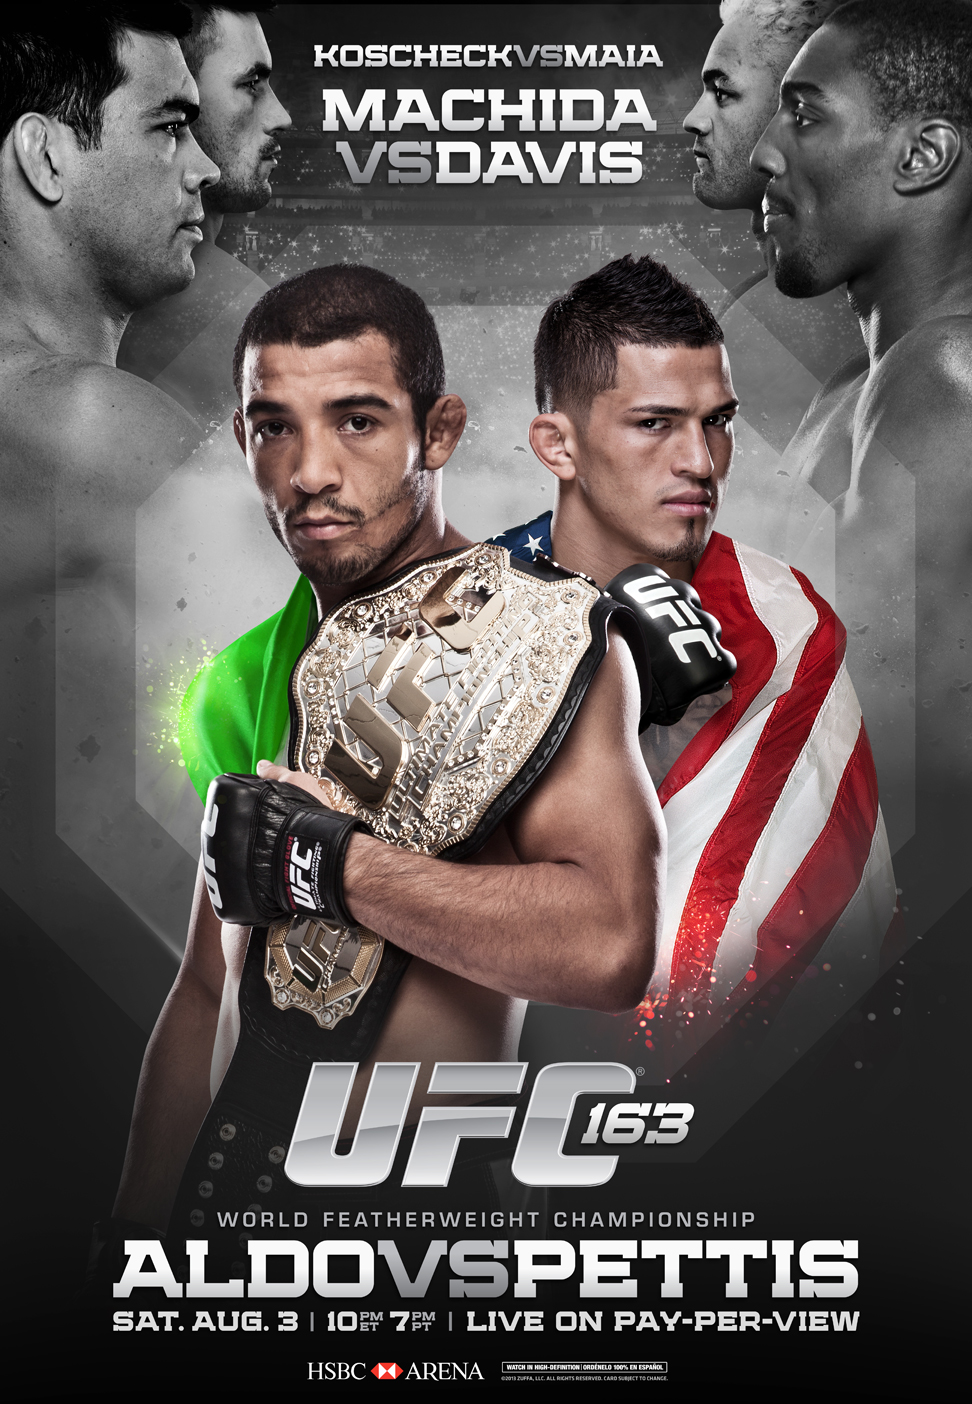 UFClogos branding UFC — KYLE CHRISTIAN DESIGNKyle ...  UFClogos brandi...